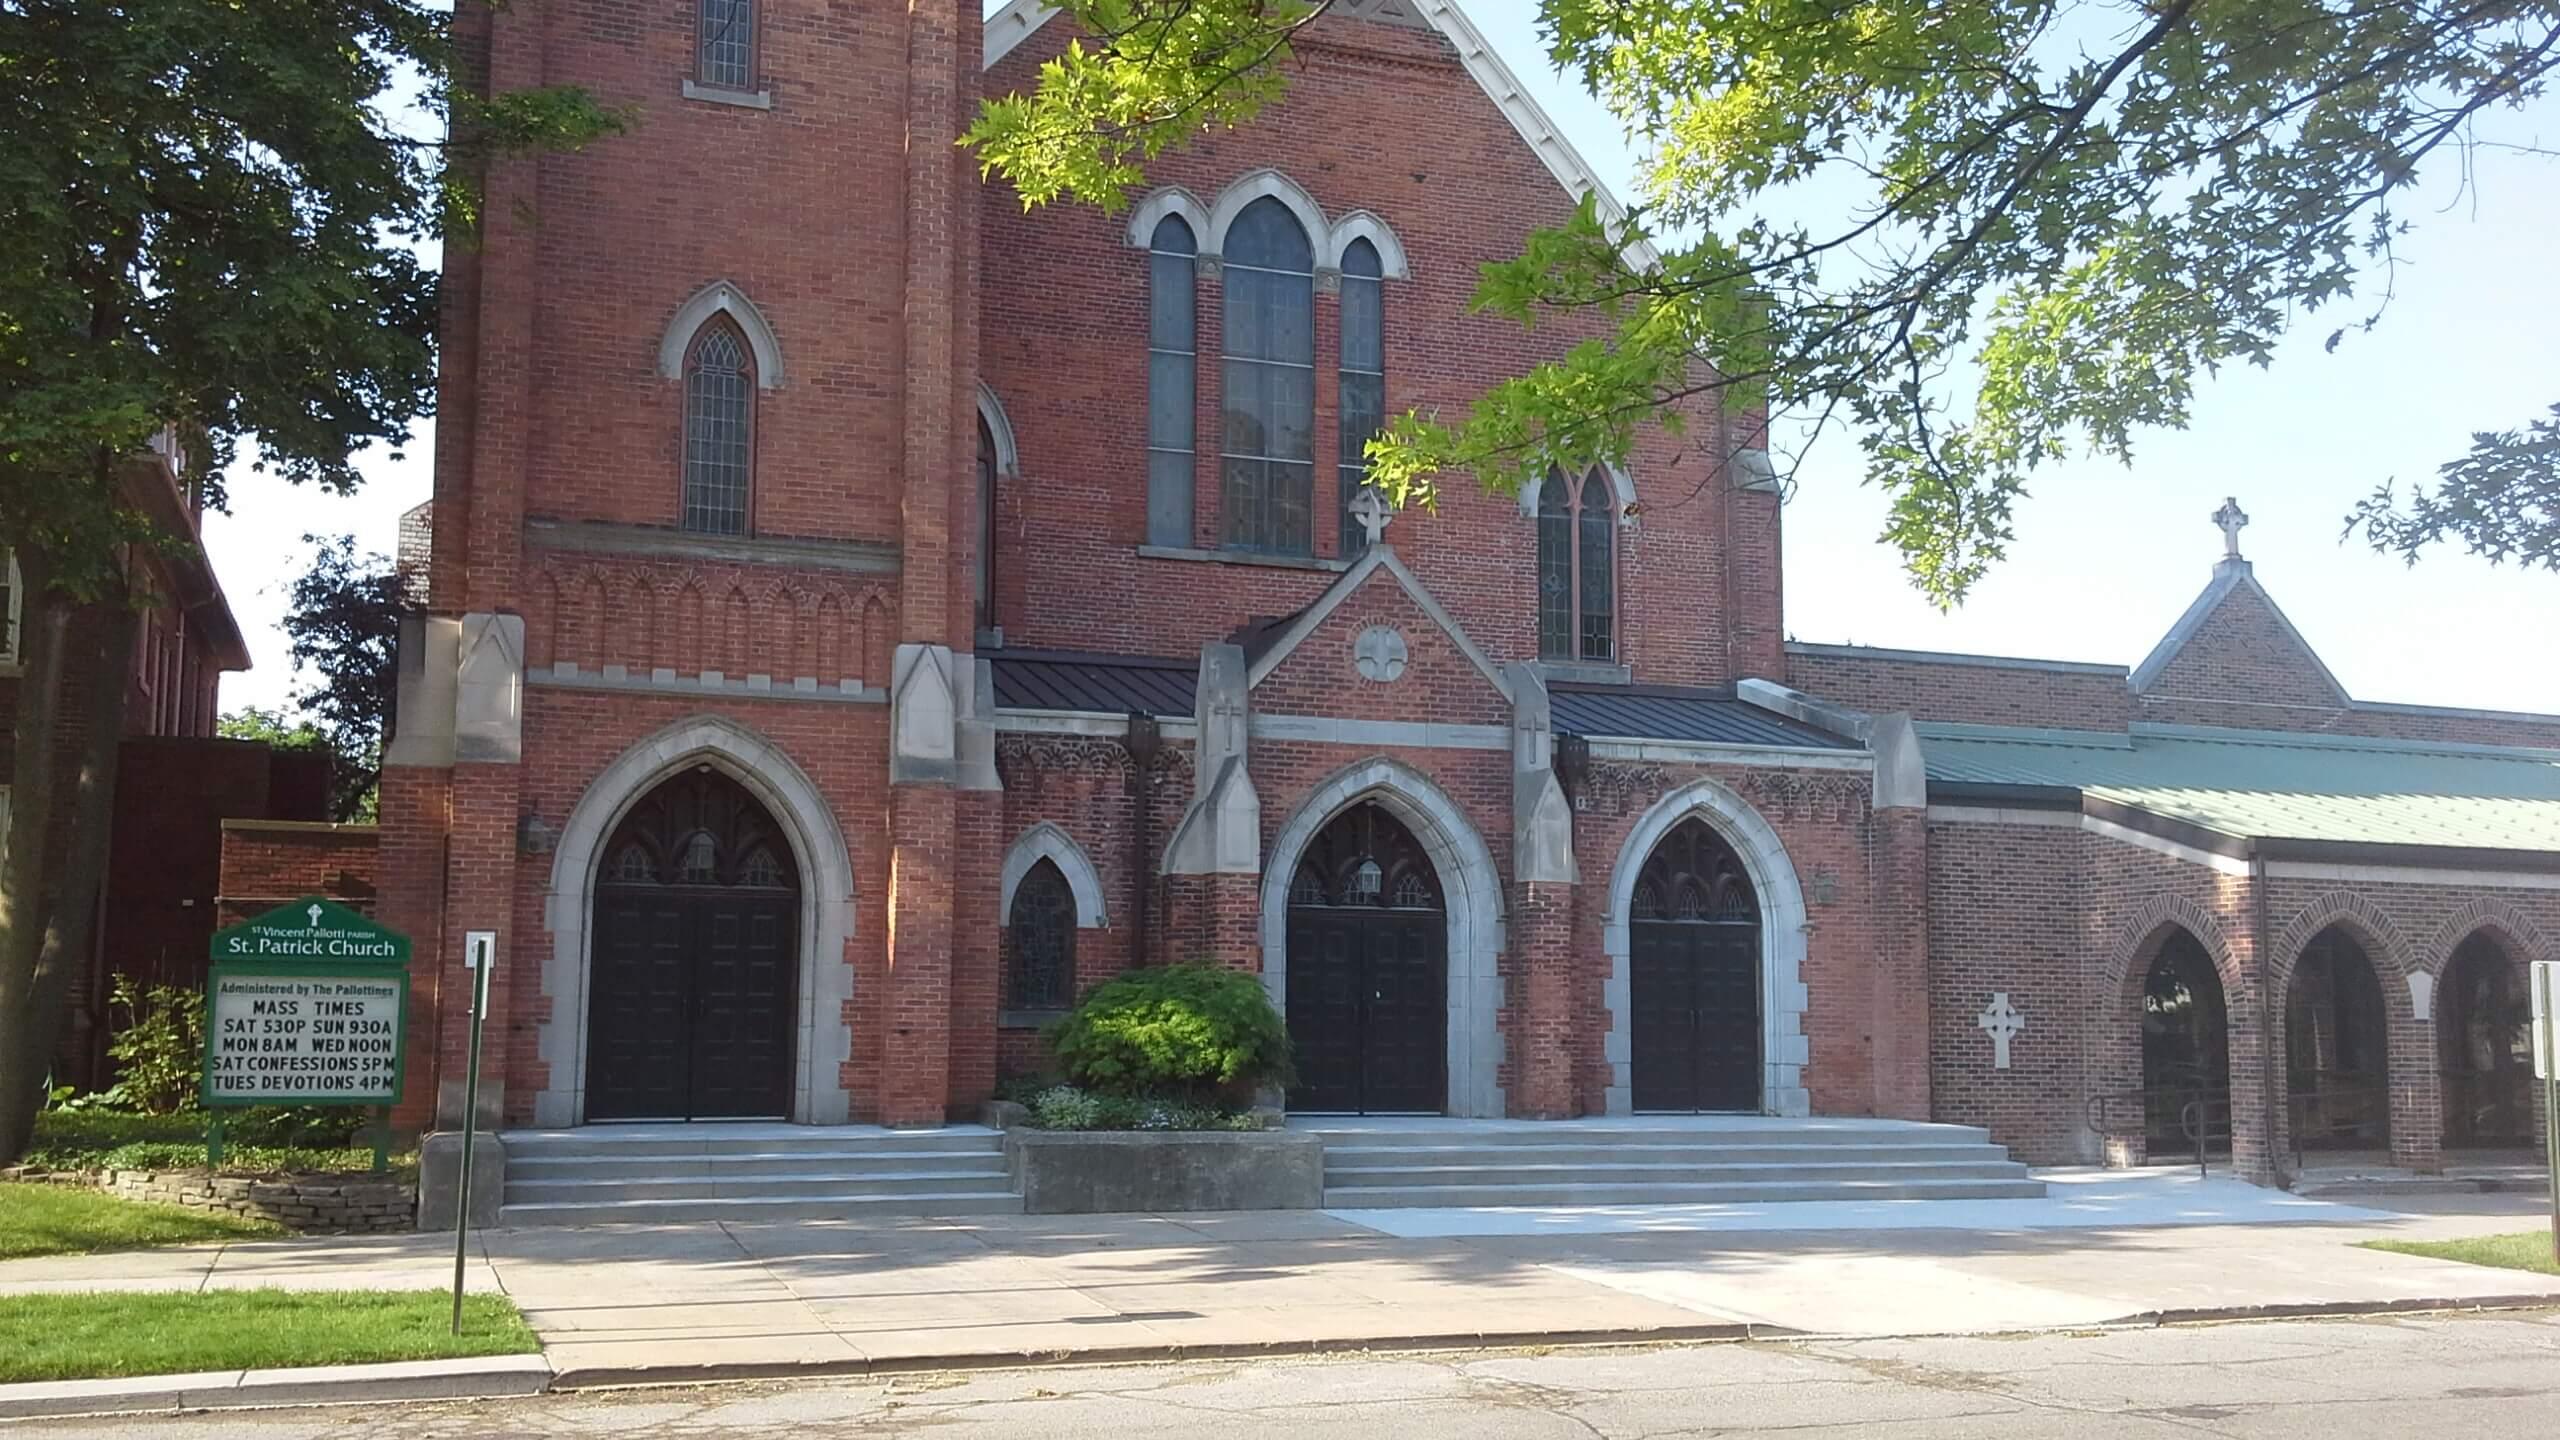 St.-Patrick-Church-2015a